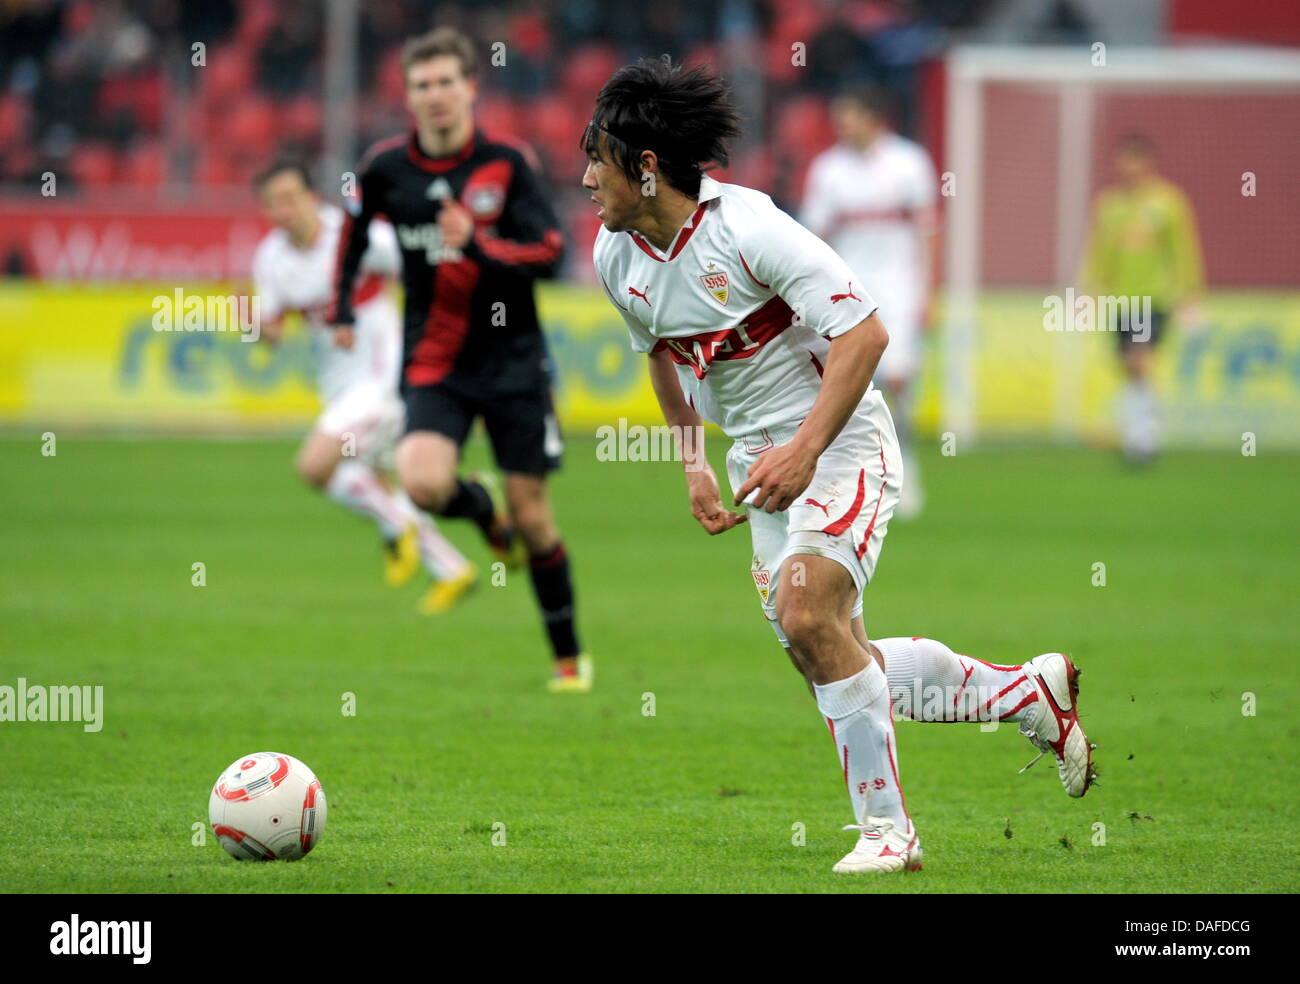 Stuttgart's Shinji Okazaki runs with the ball during the Bundesliga soccer match between Bayer Leverkusen and - Stock Image